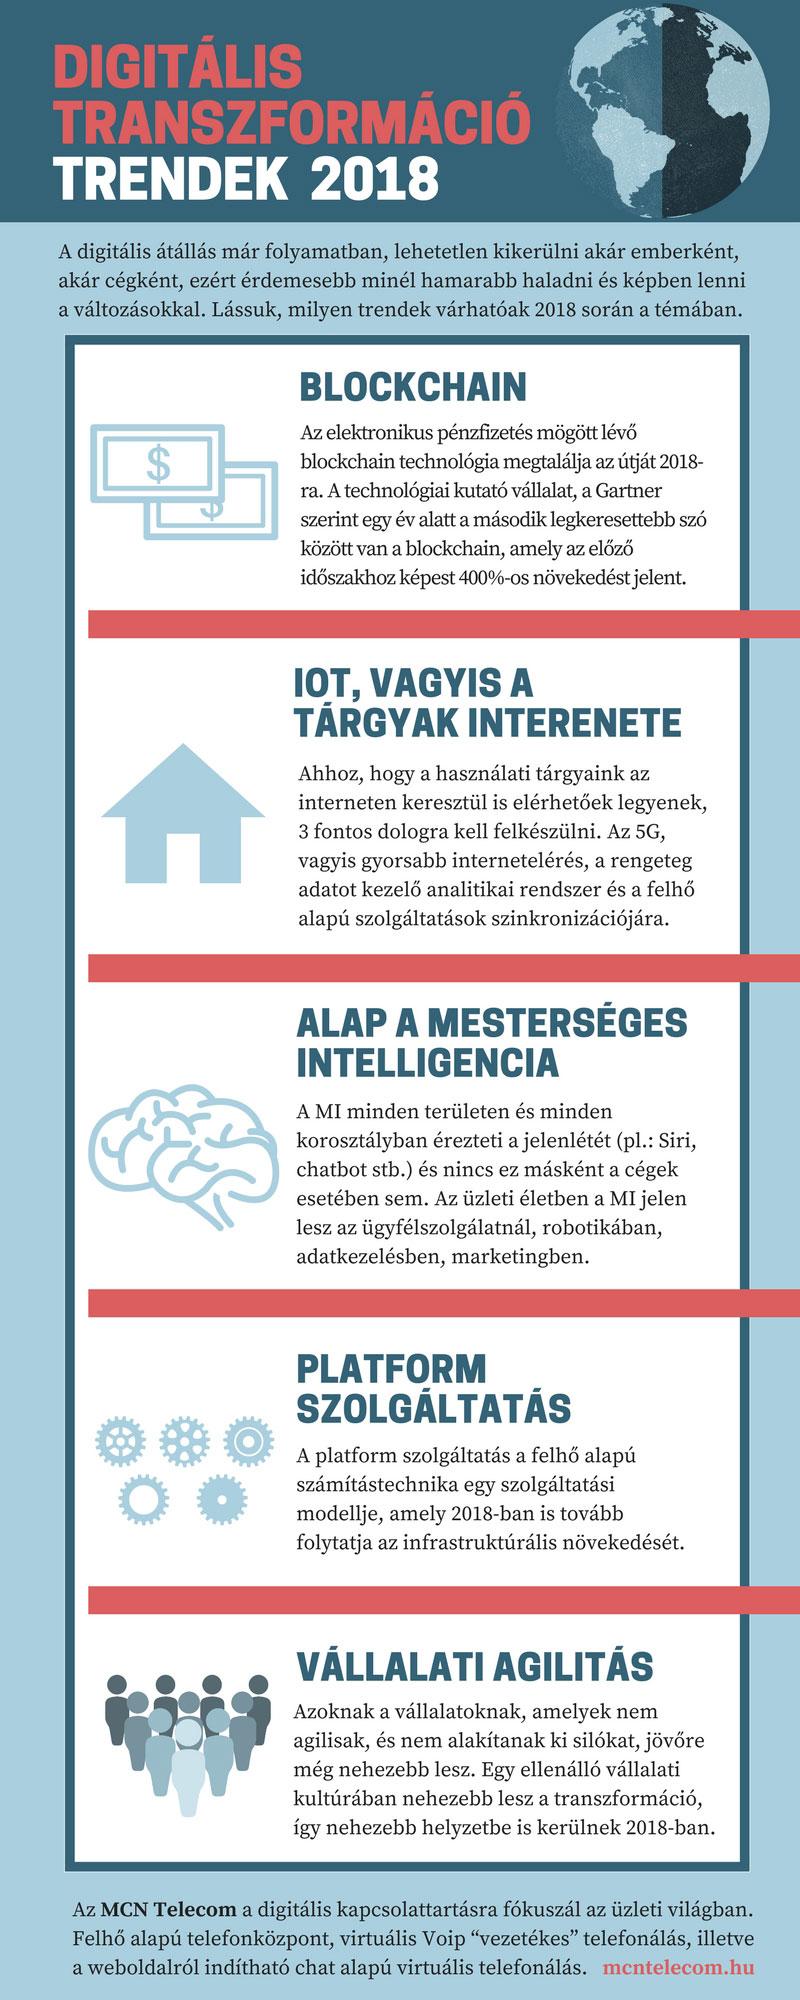 digitalis-transzformacio-trendek-2018_infografika_mcntelecom_1.jpg